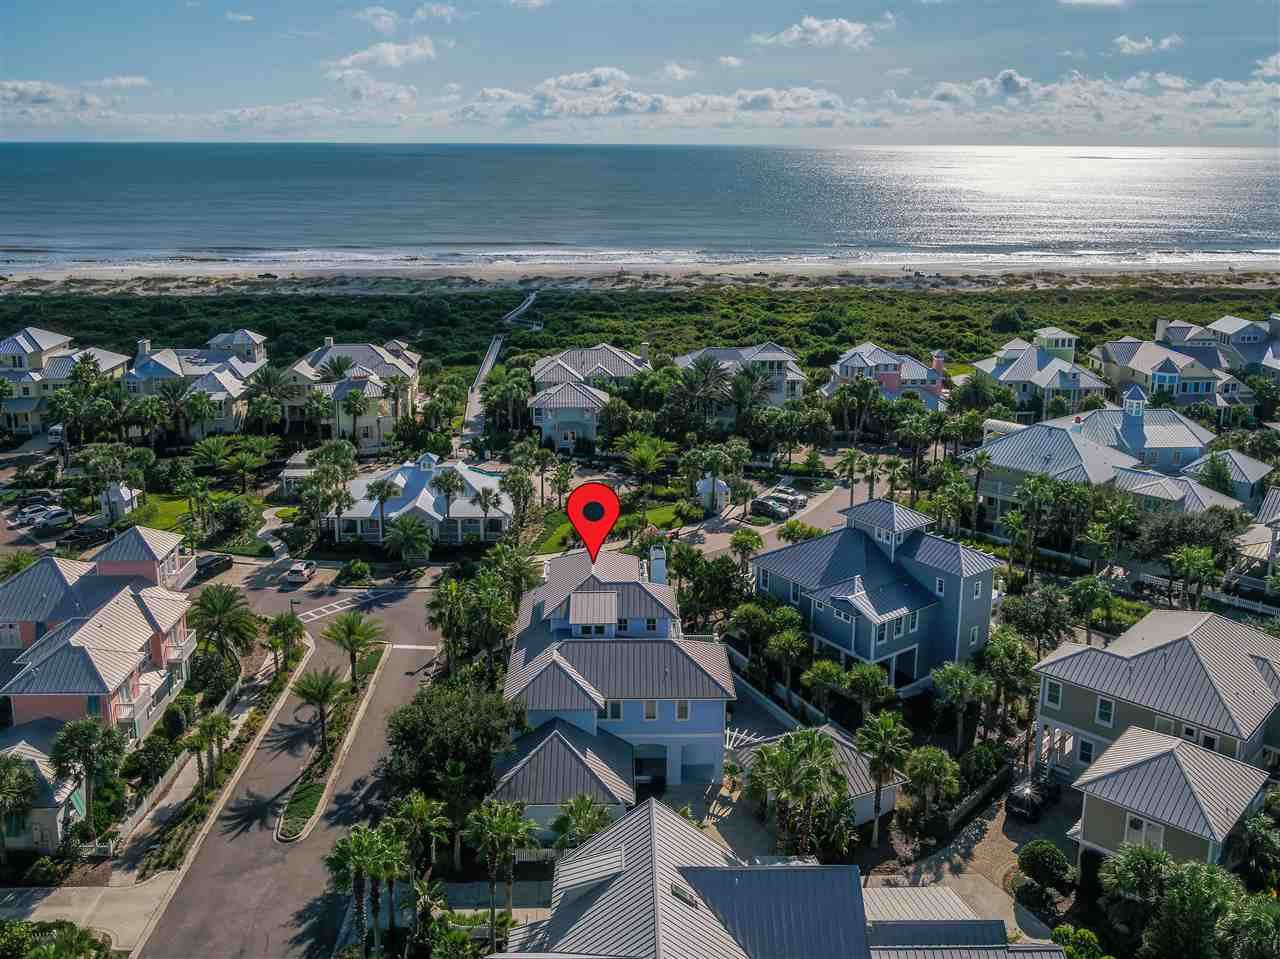 Photo of 677 Ocean Palm Way, St Augustine, FL 32080 (MLS # 198438)